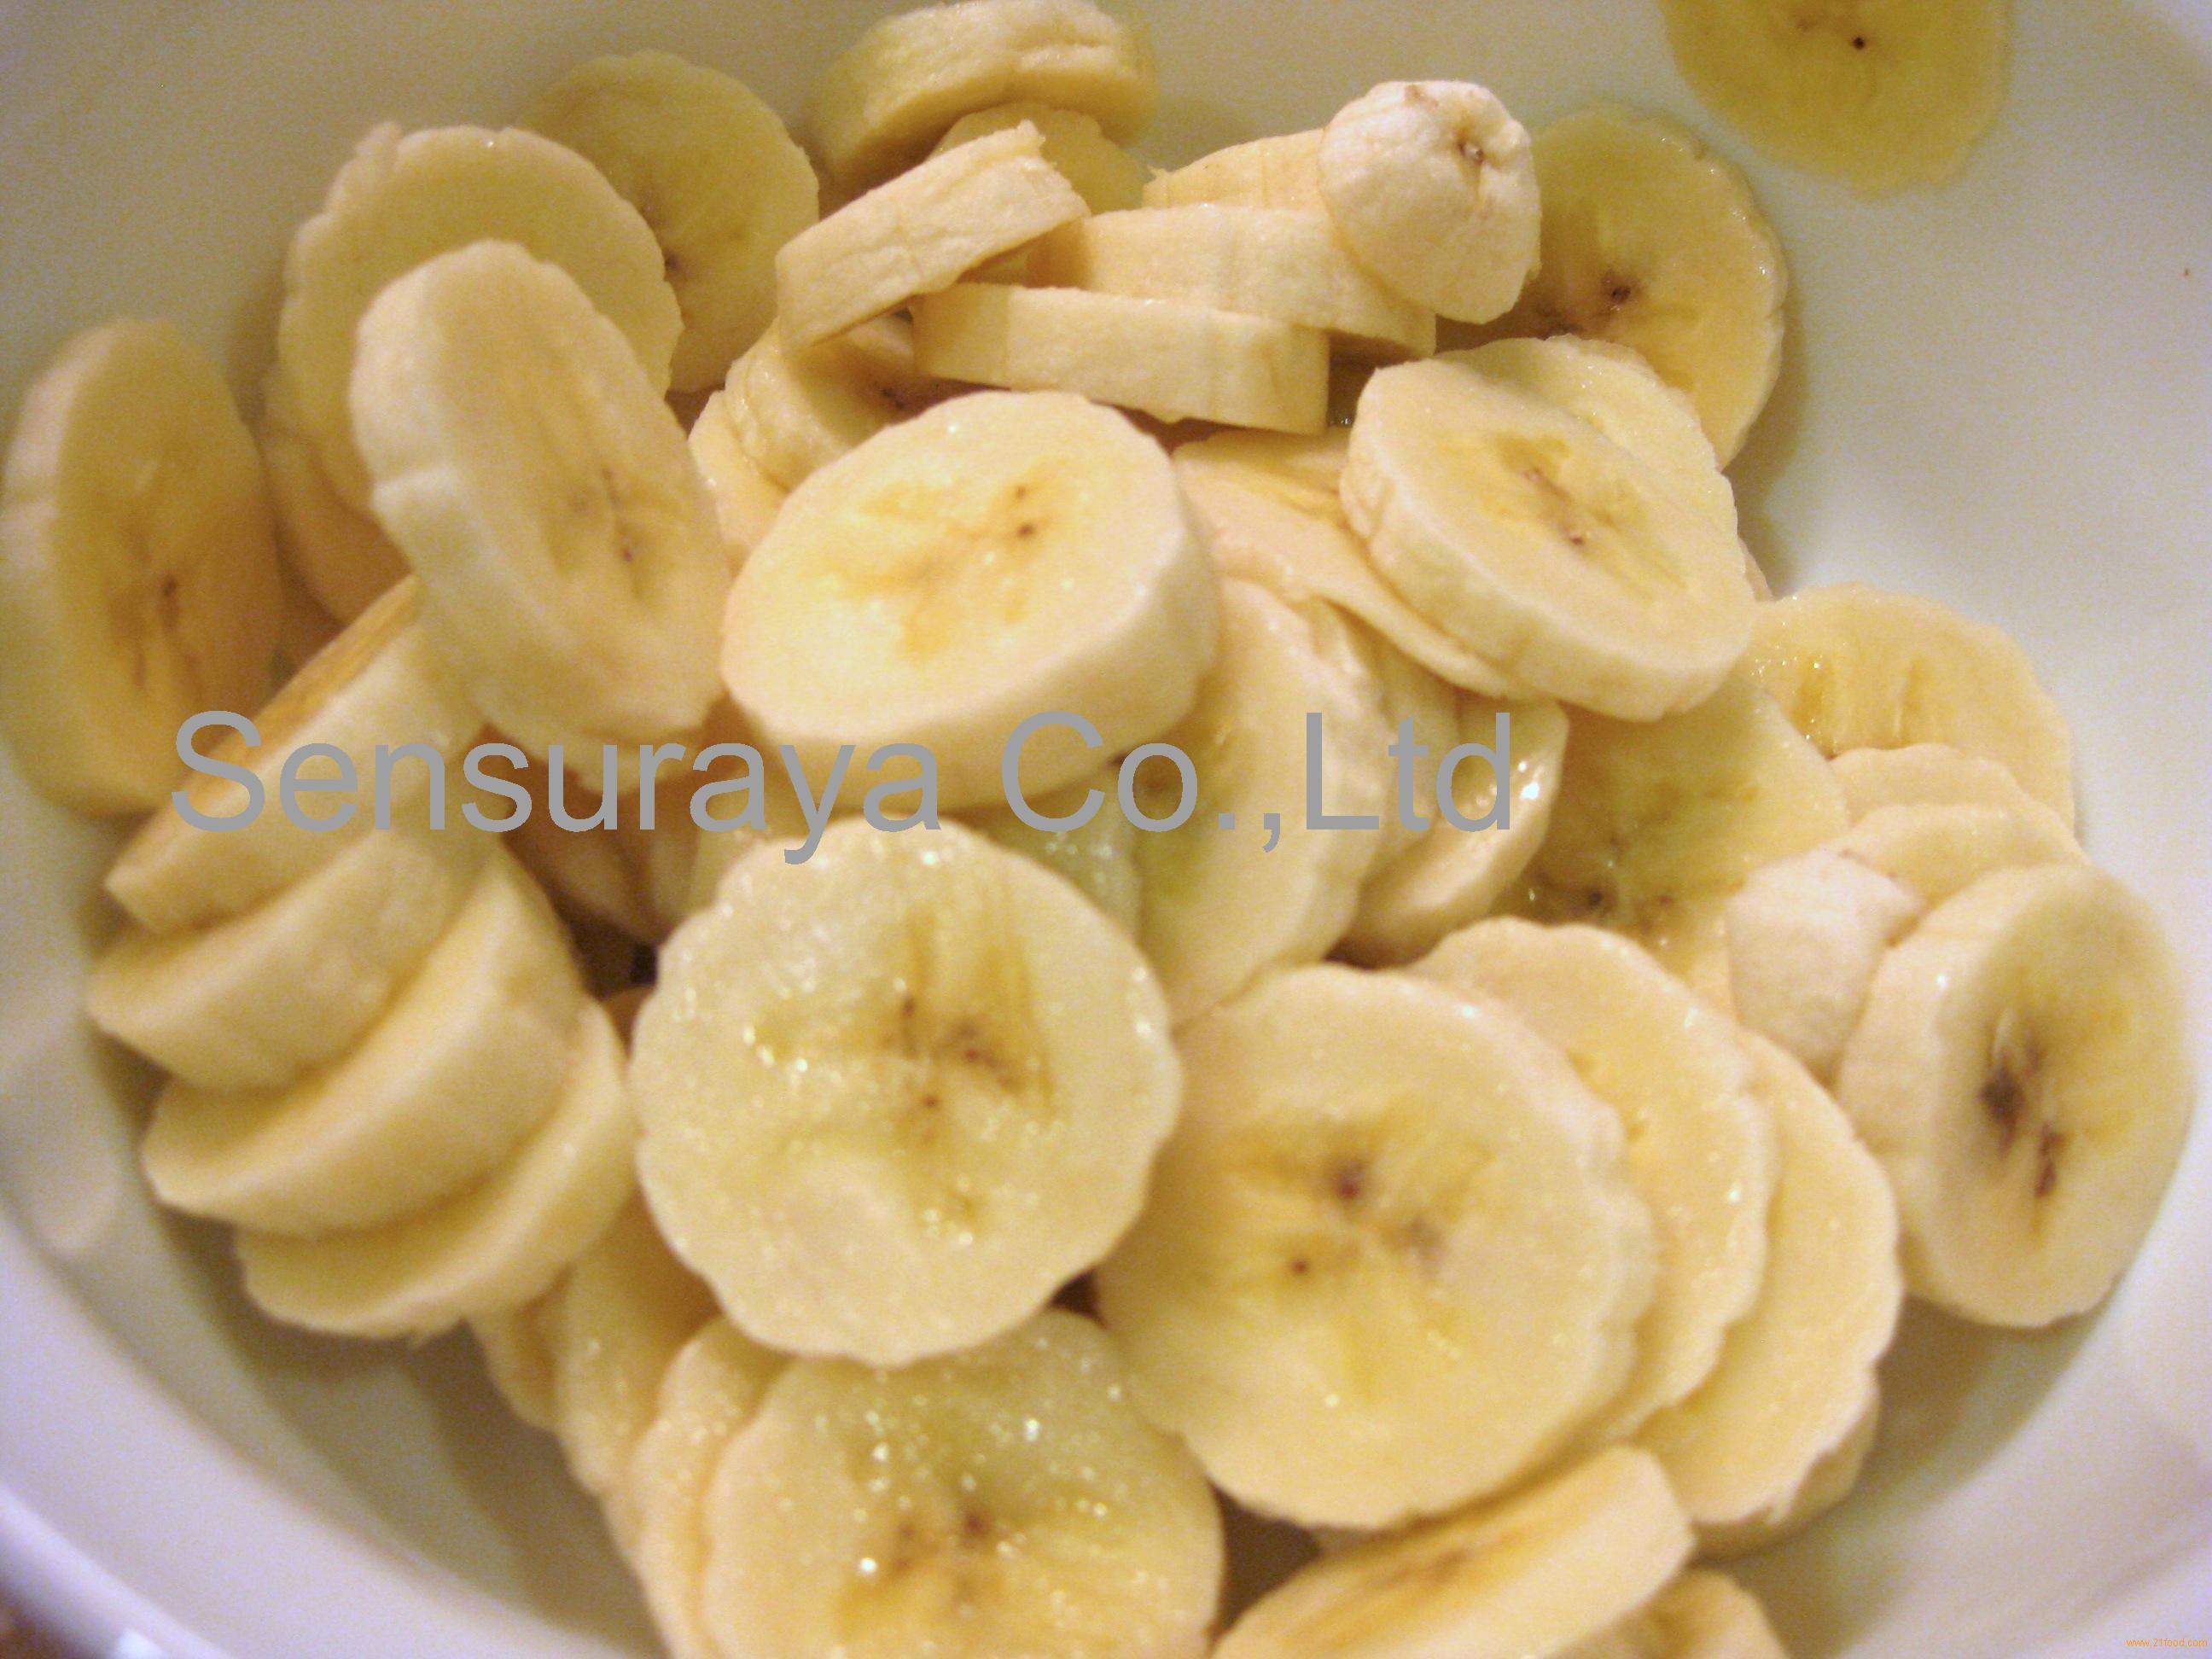 Organic Freeze Dried Organic Banana